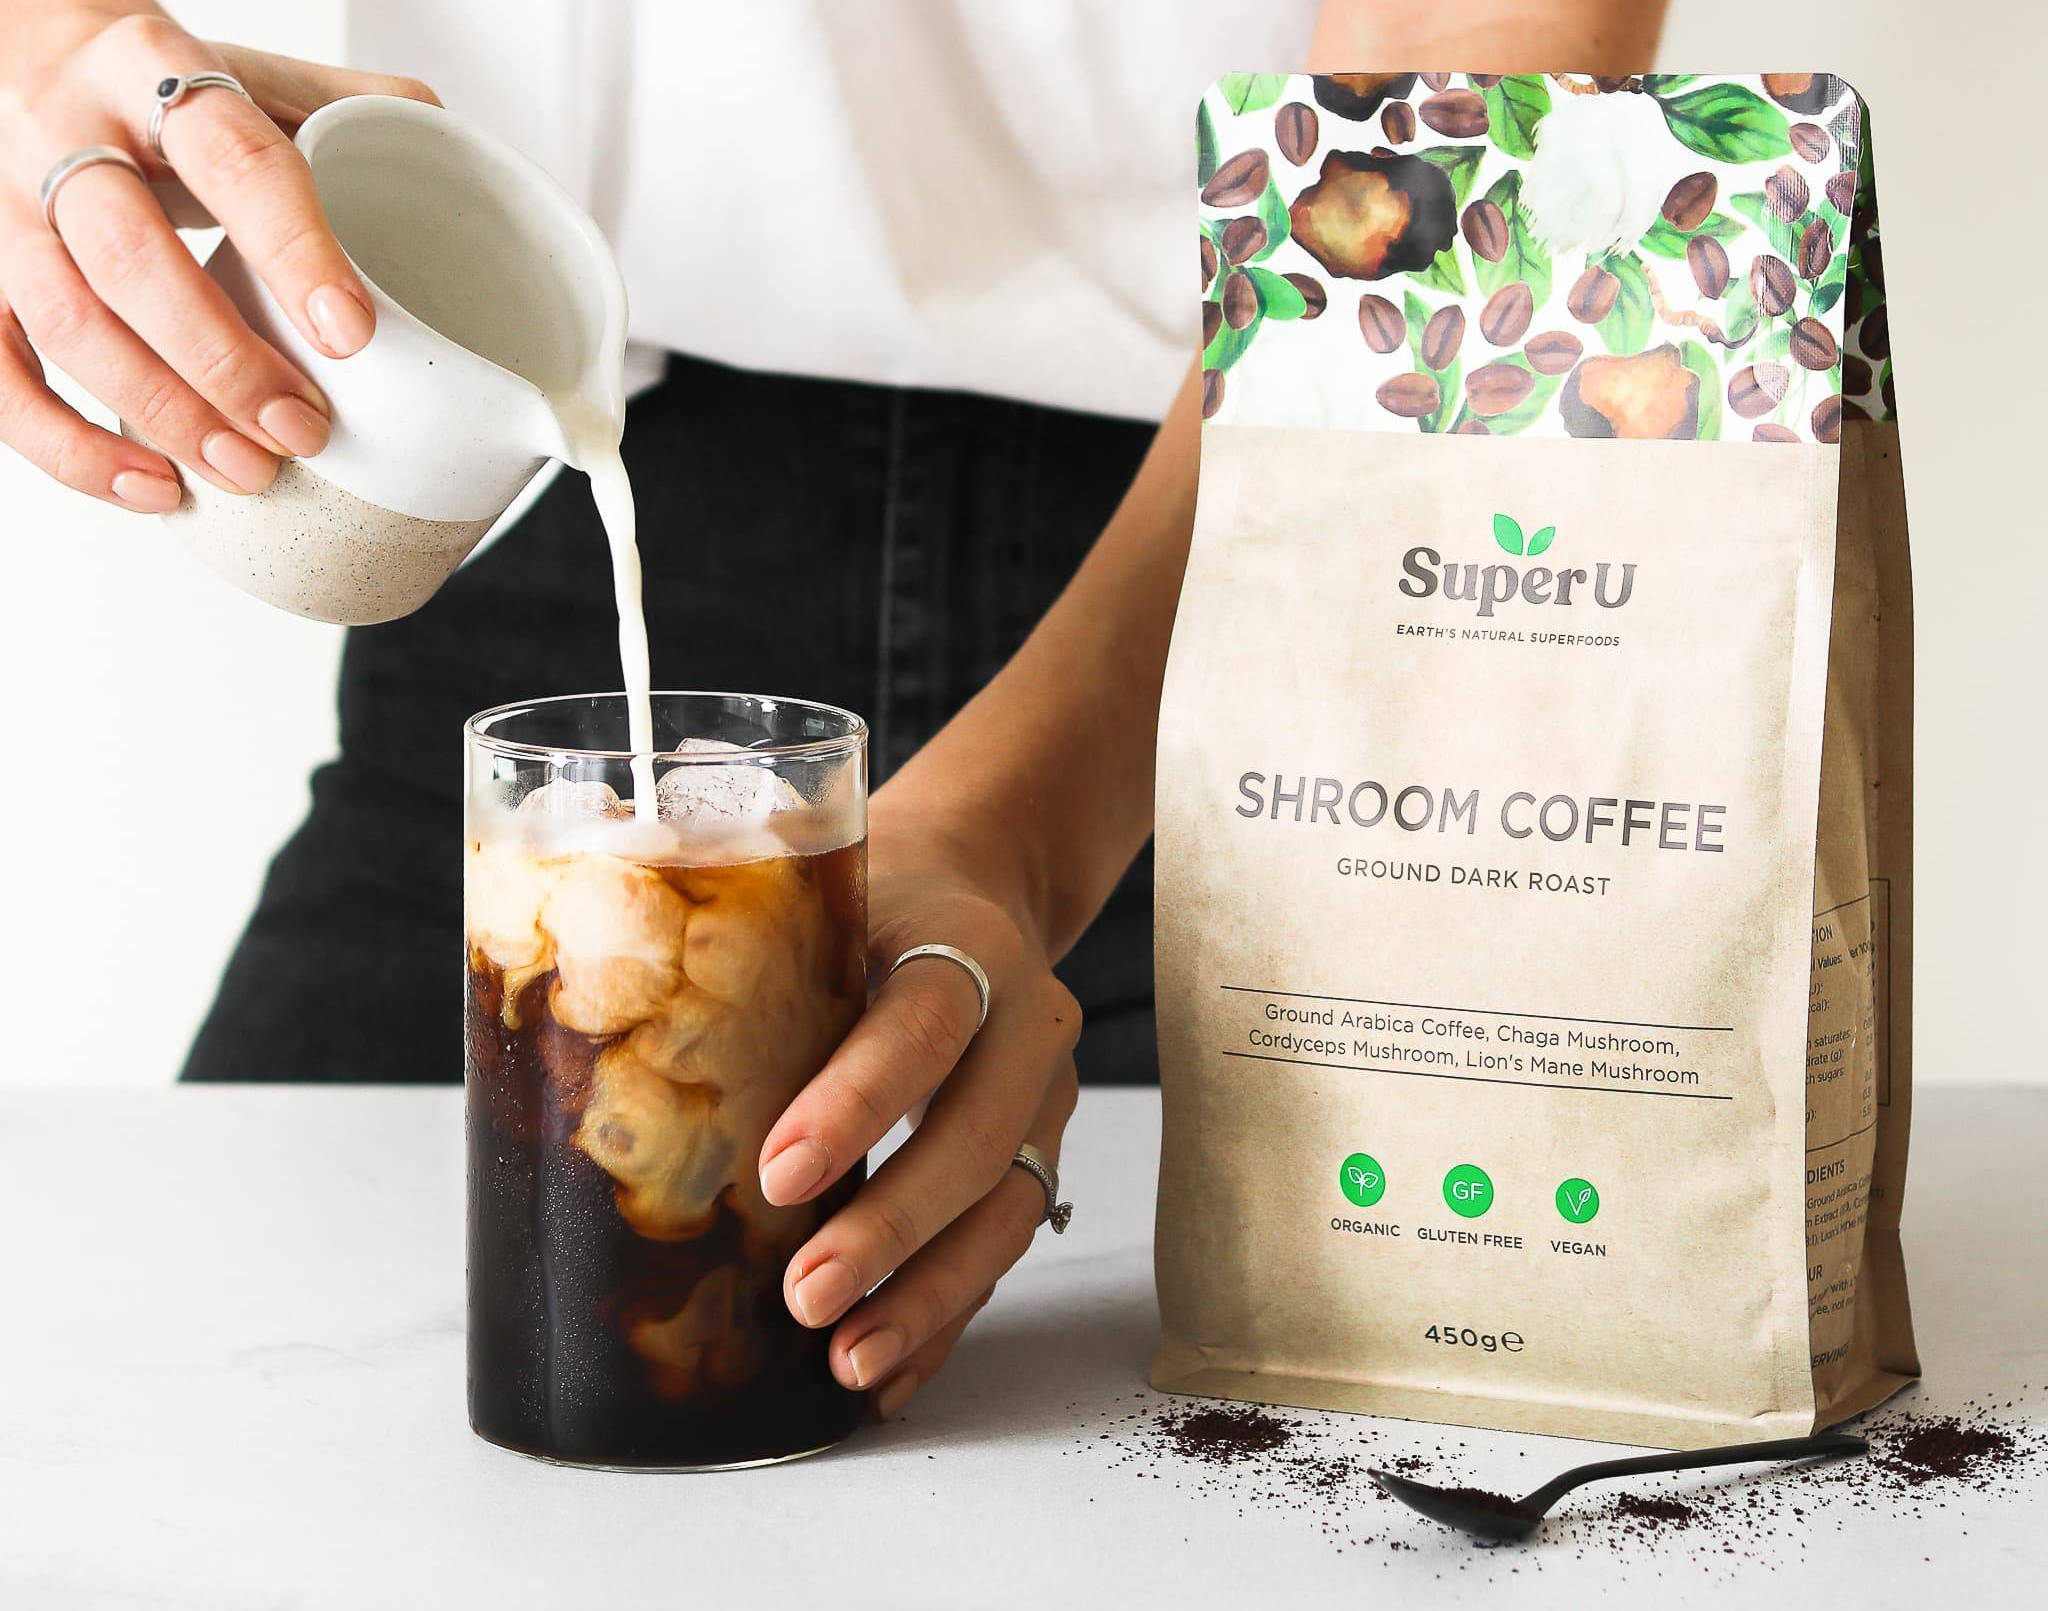 Ground mushroom coffee with lion's mane, Chaga and Cordyceps mushroom and organic arabica coffee.